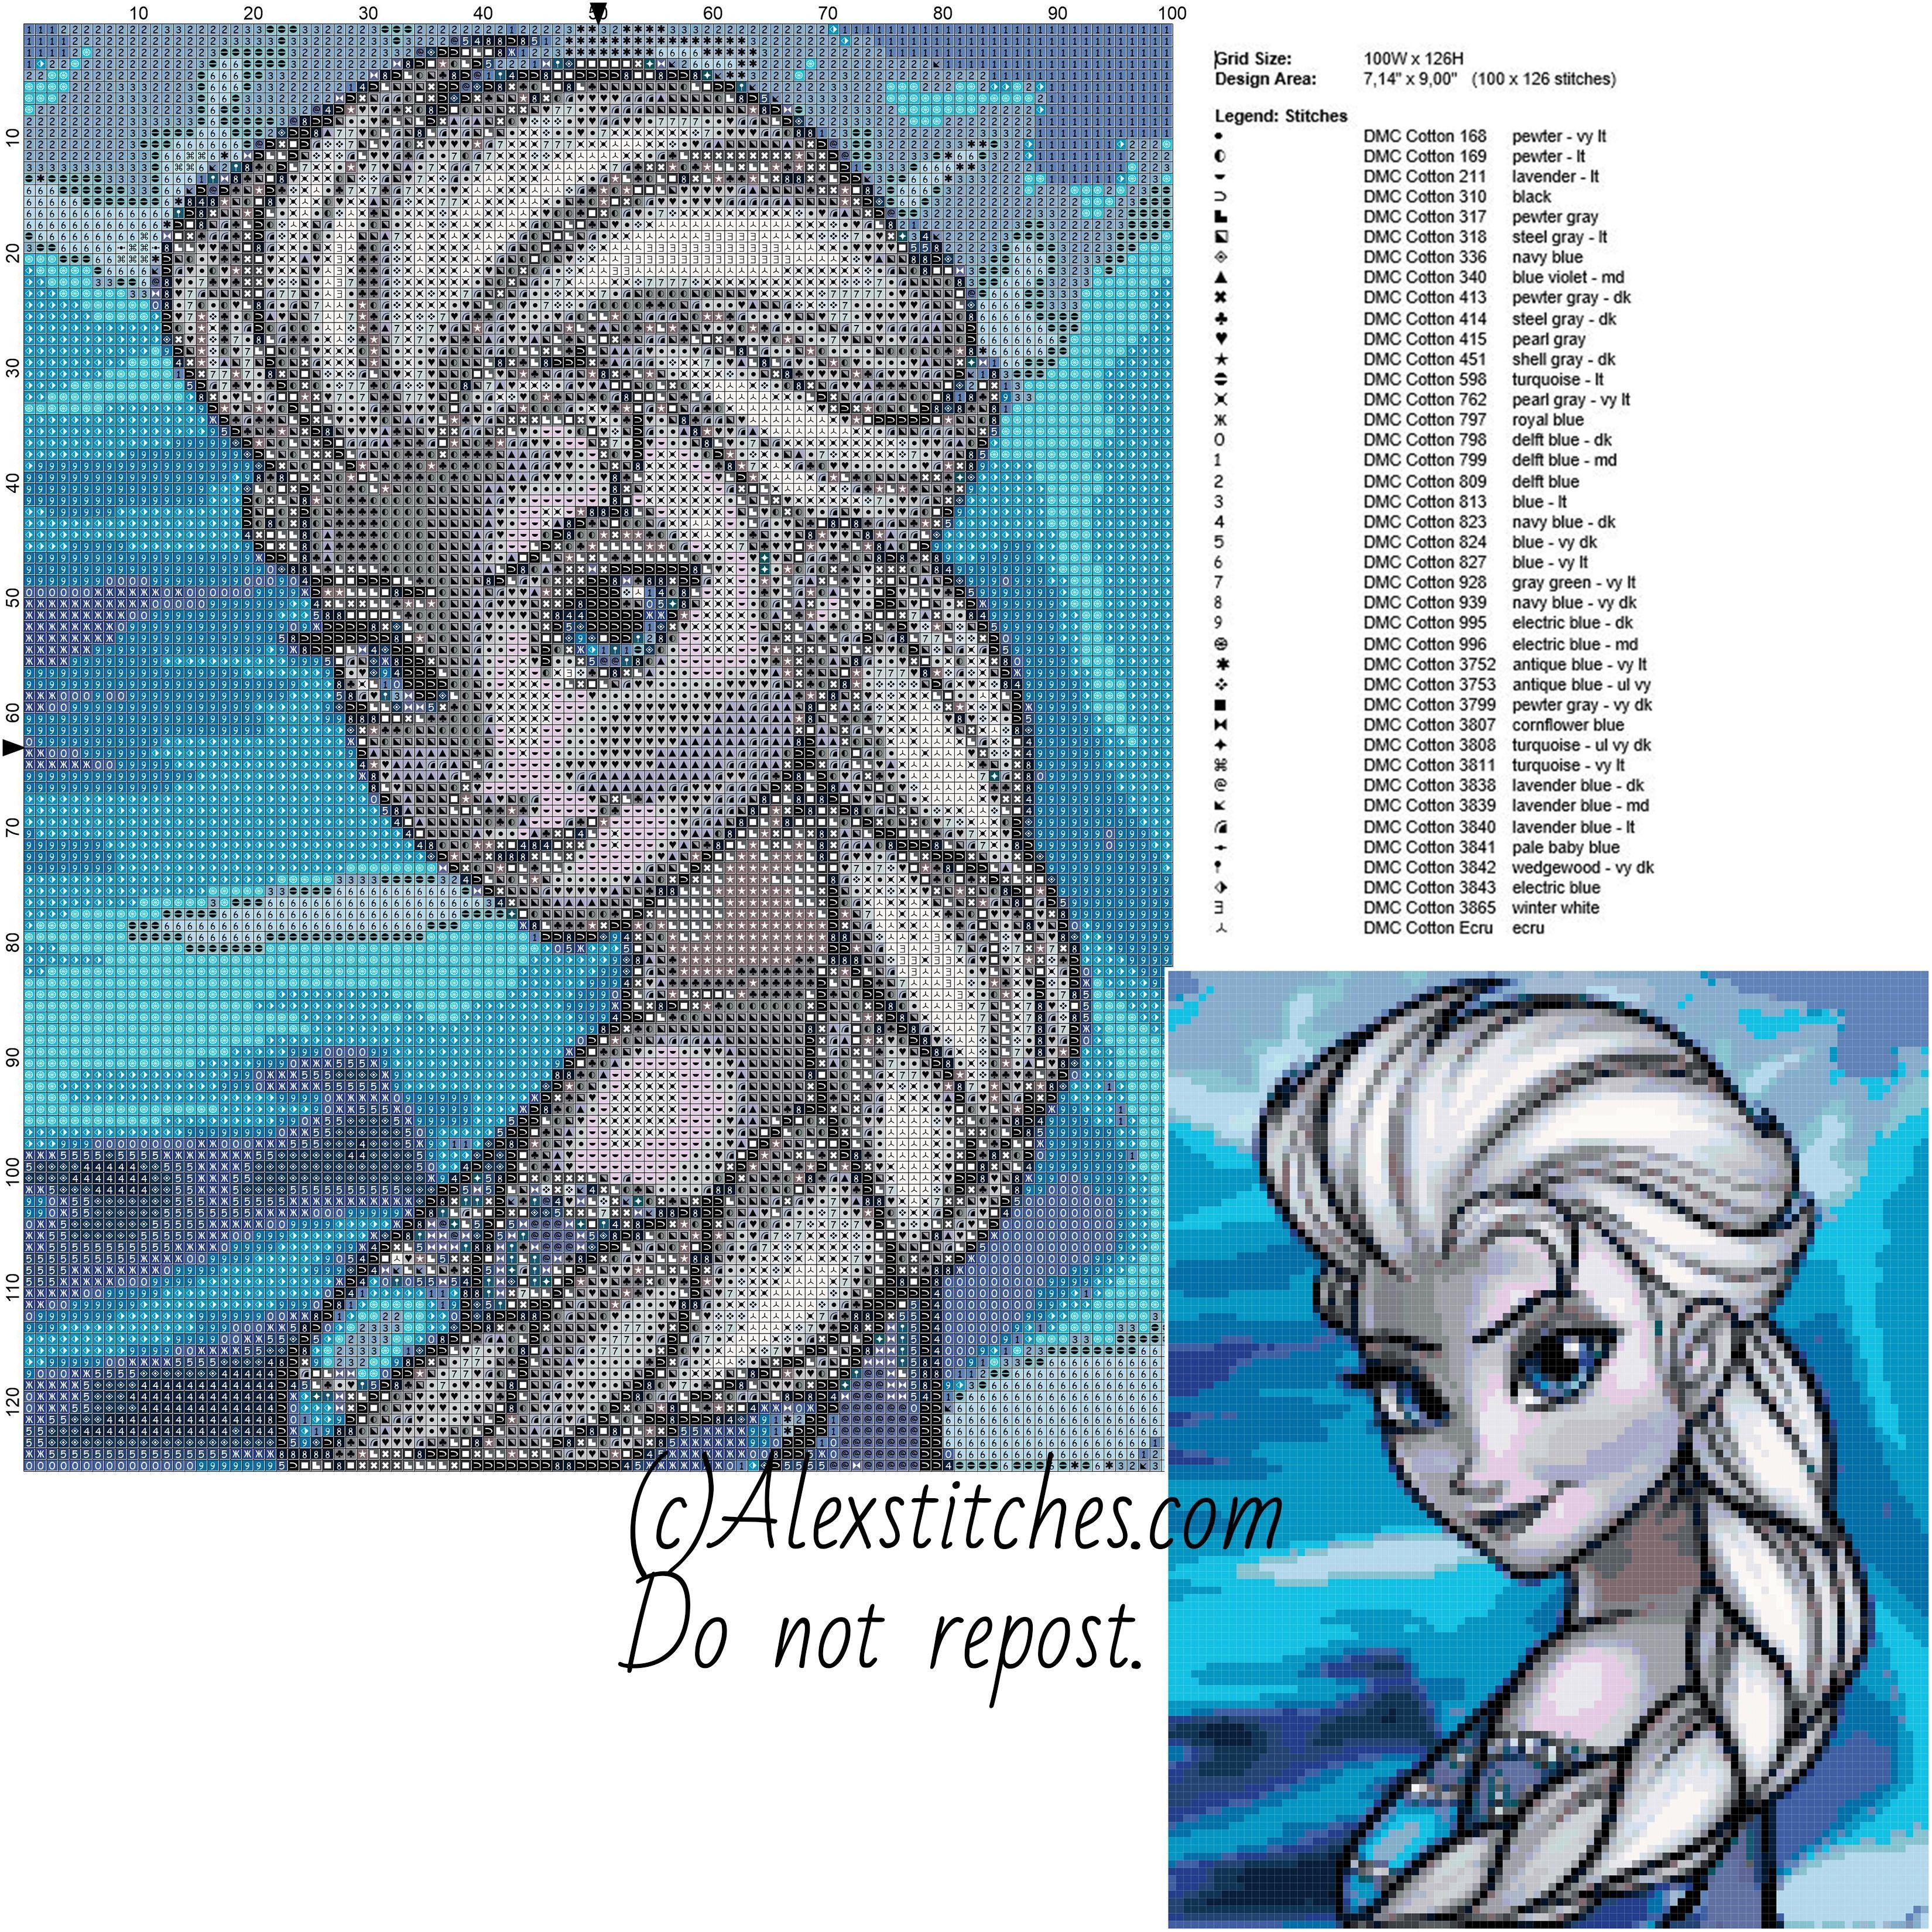 Elsas portrait disney frozen free cross stitch pattern 100x126 40